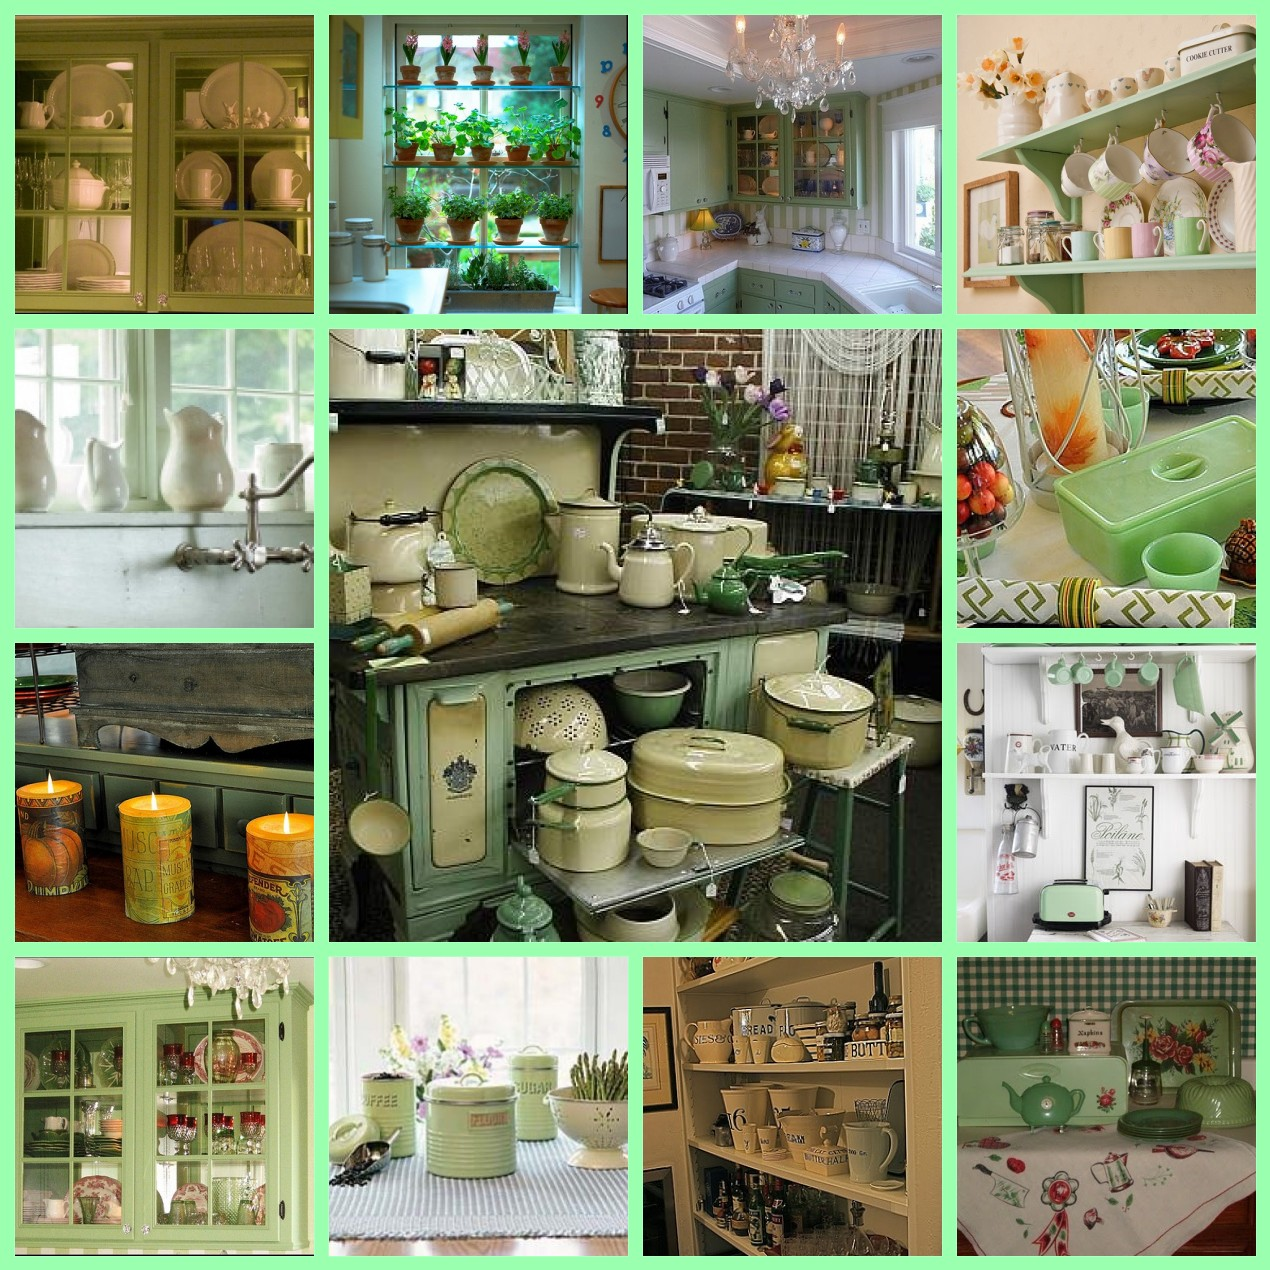 Dream Kitchen Rockland Maine: Estelle's: A Dream Kitchen...For The Love Of Jadite